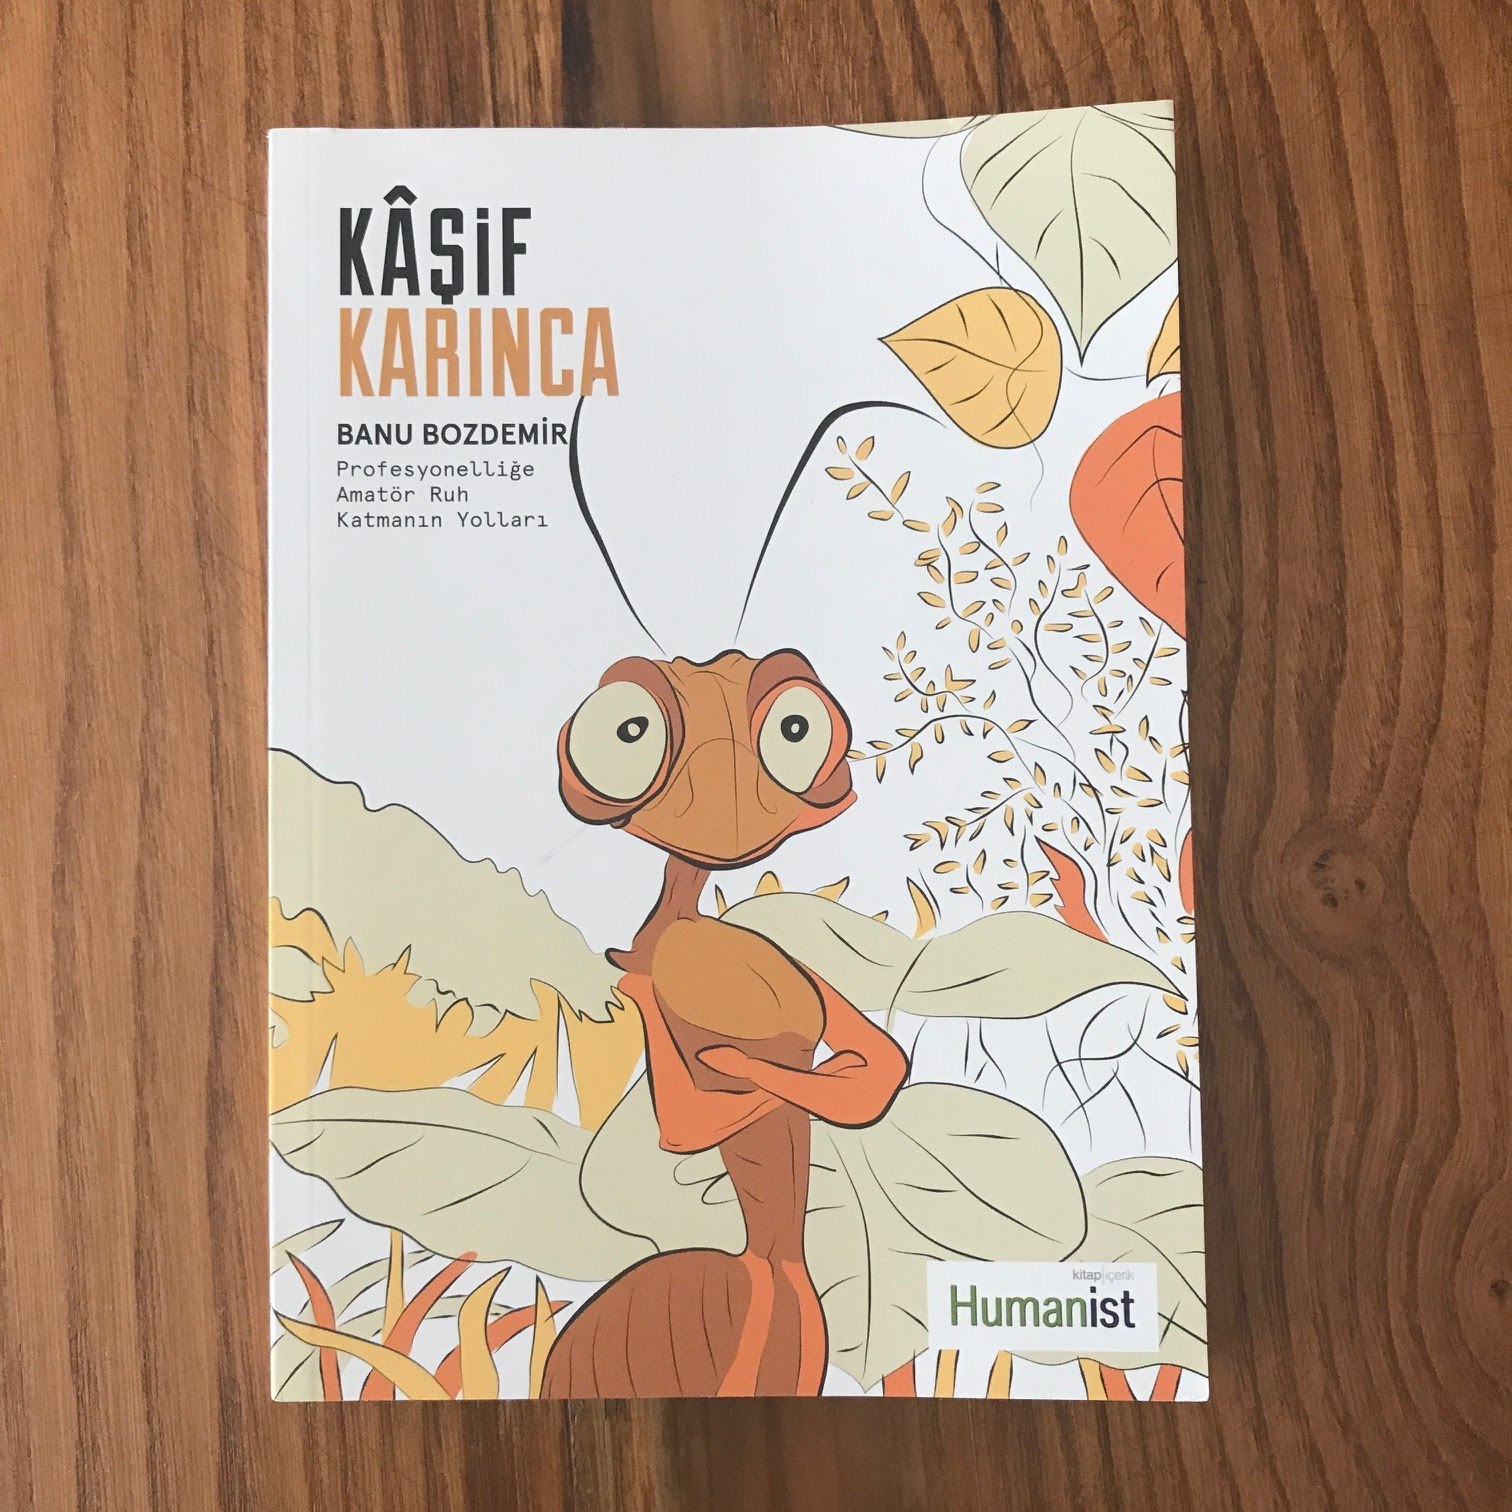 Kasif Karinca - Profesyonellige Amator Ruh Katmanin Yollari (Kitap)